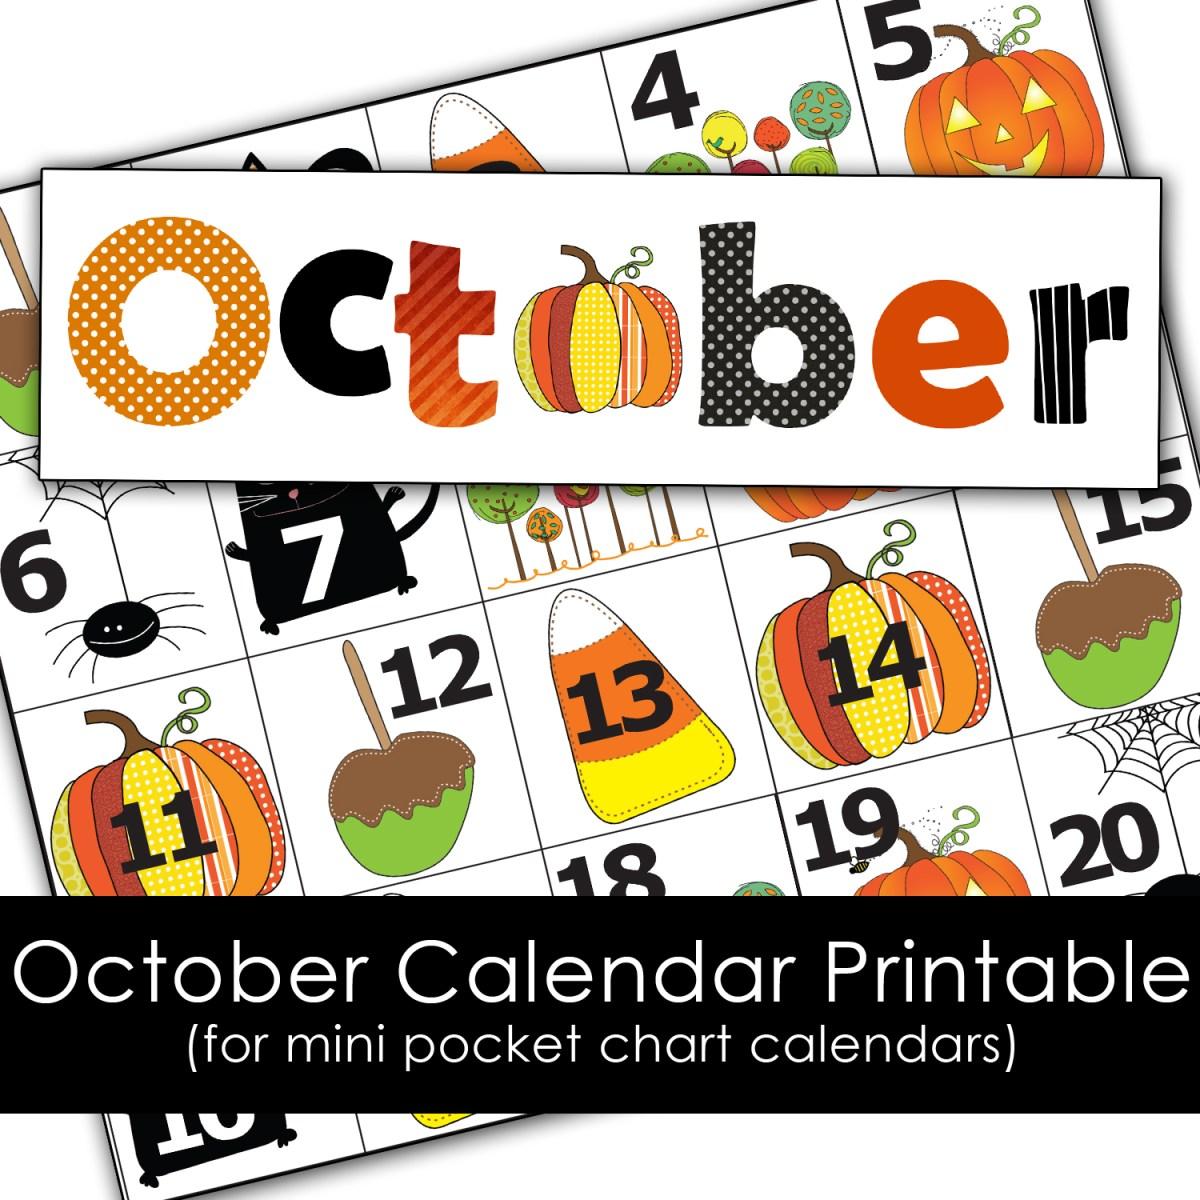 October Calendar Printables